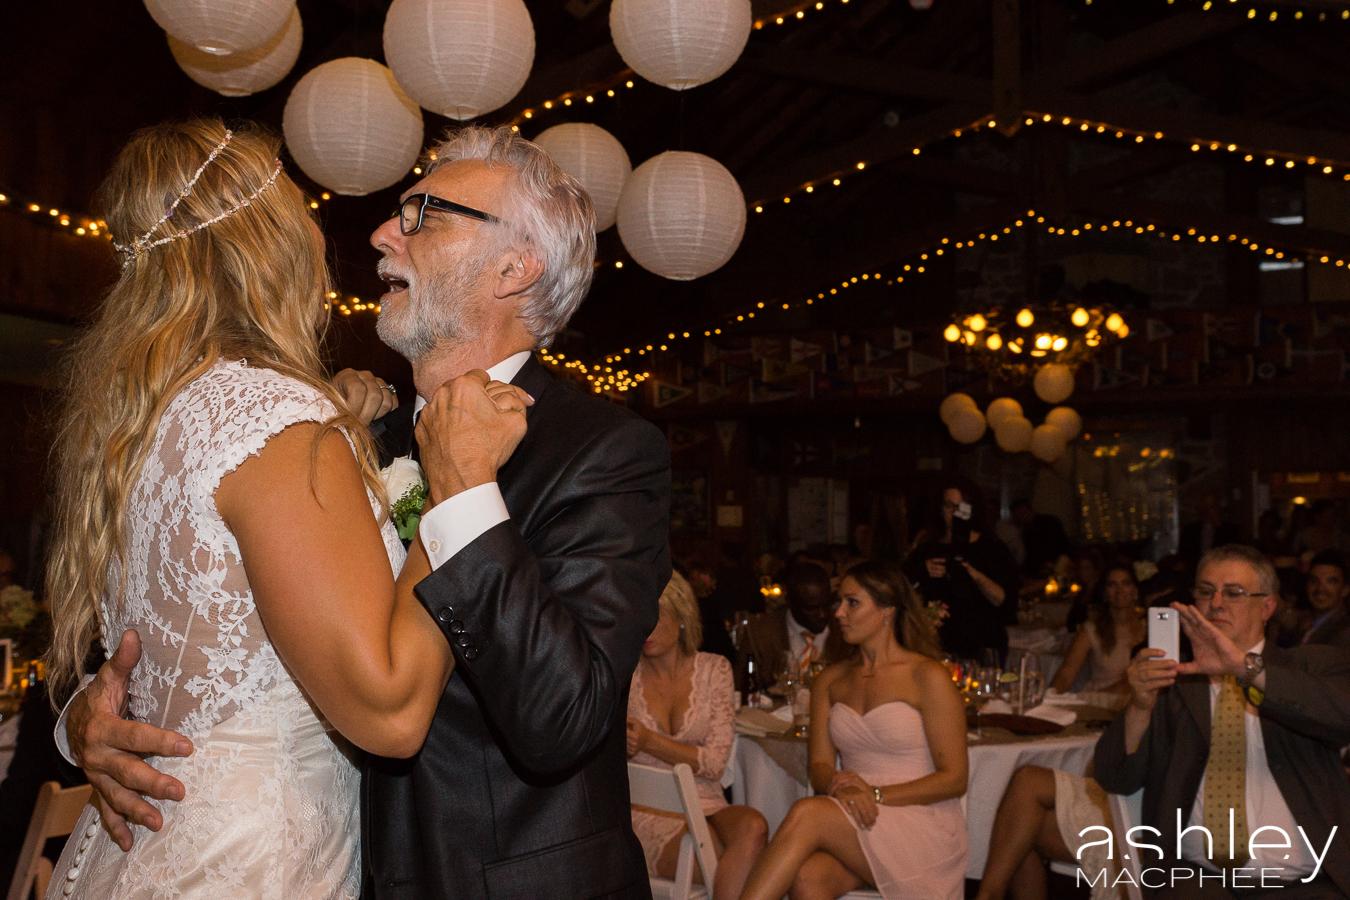 Ashley MacPhee Photography Hudson Yacht Club wedding photographer (98 of 112).jpg